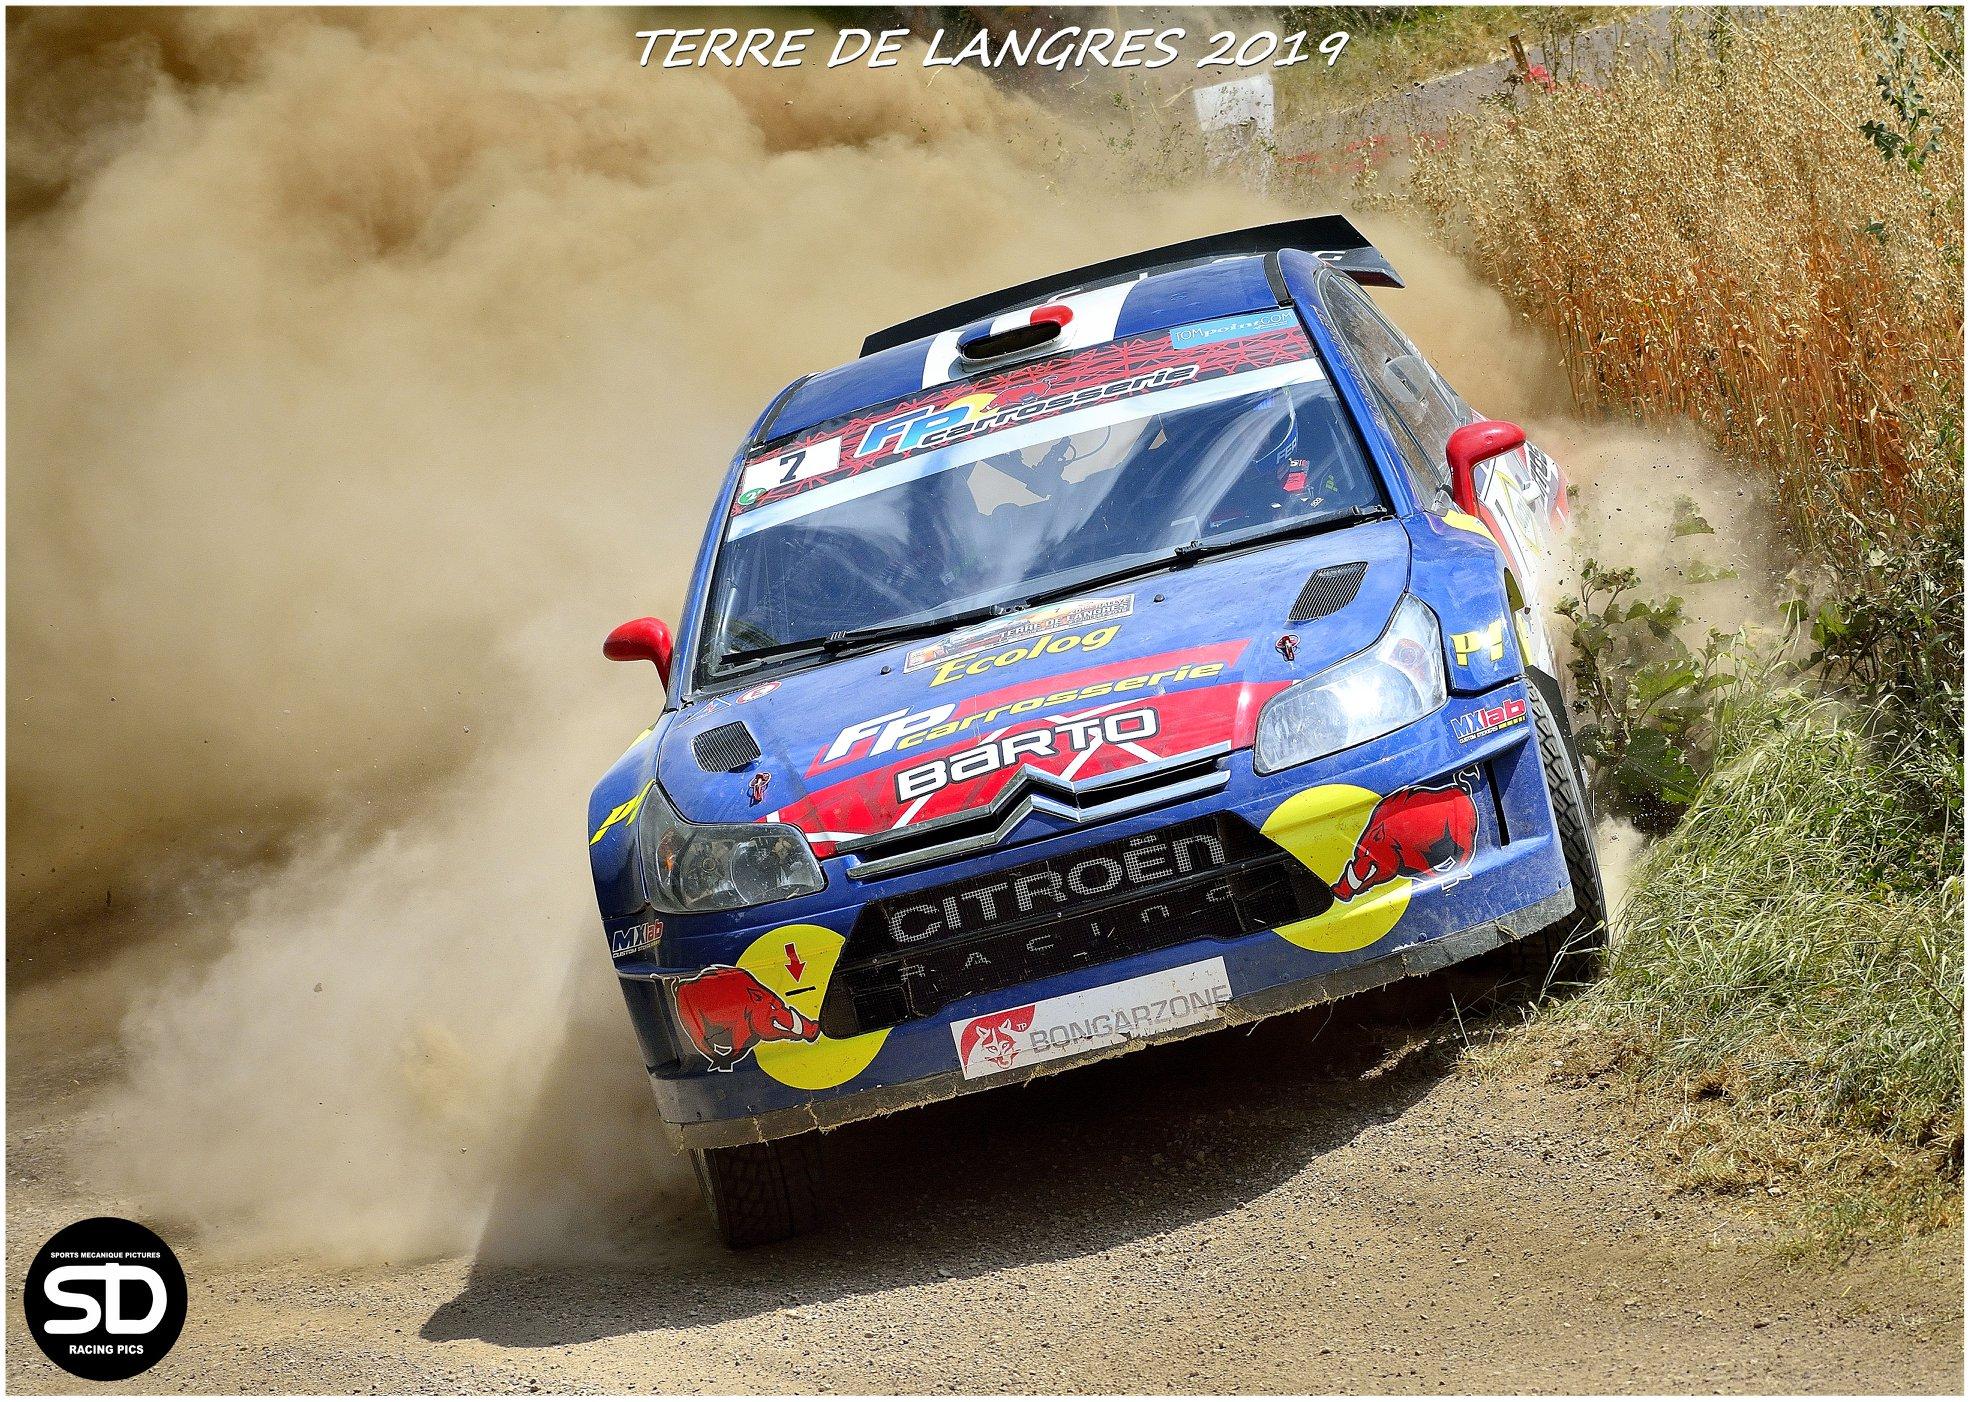 Cyrille Feraud-Jean Paul Lazzarini (SD RacingPics)